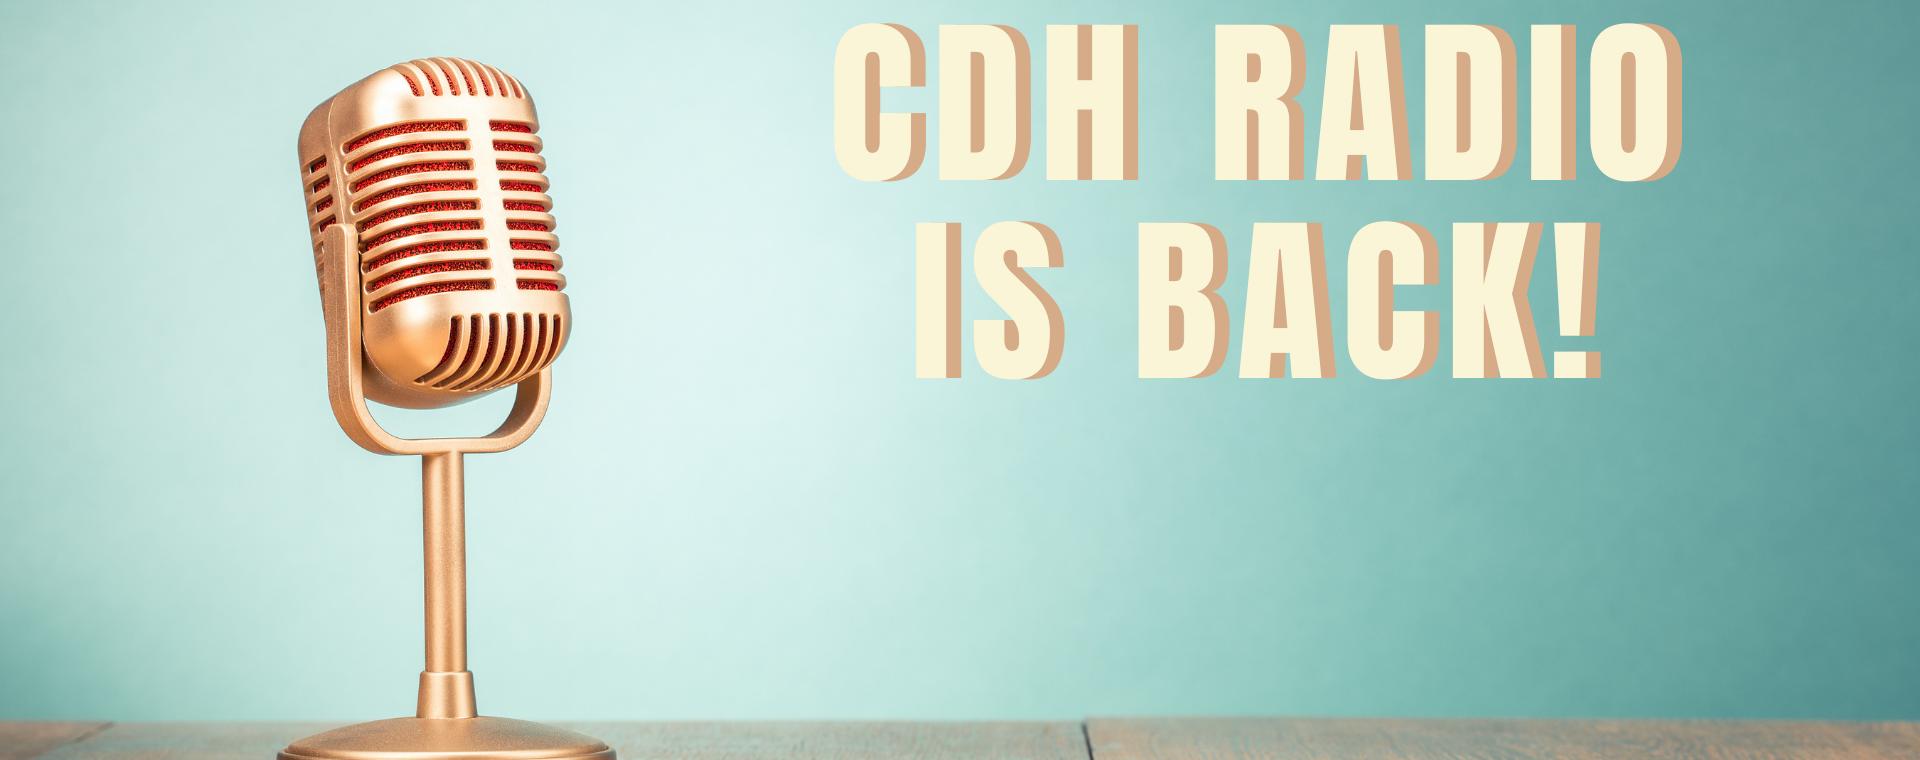 CDH Radio is back!